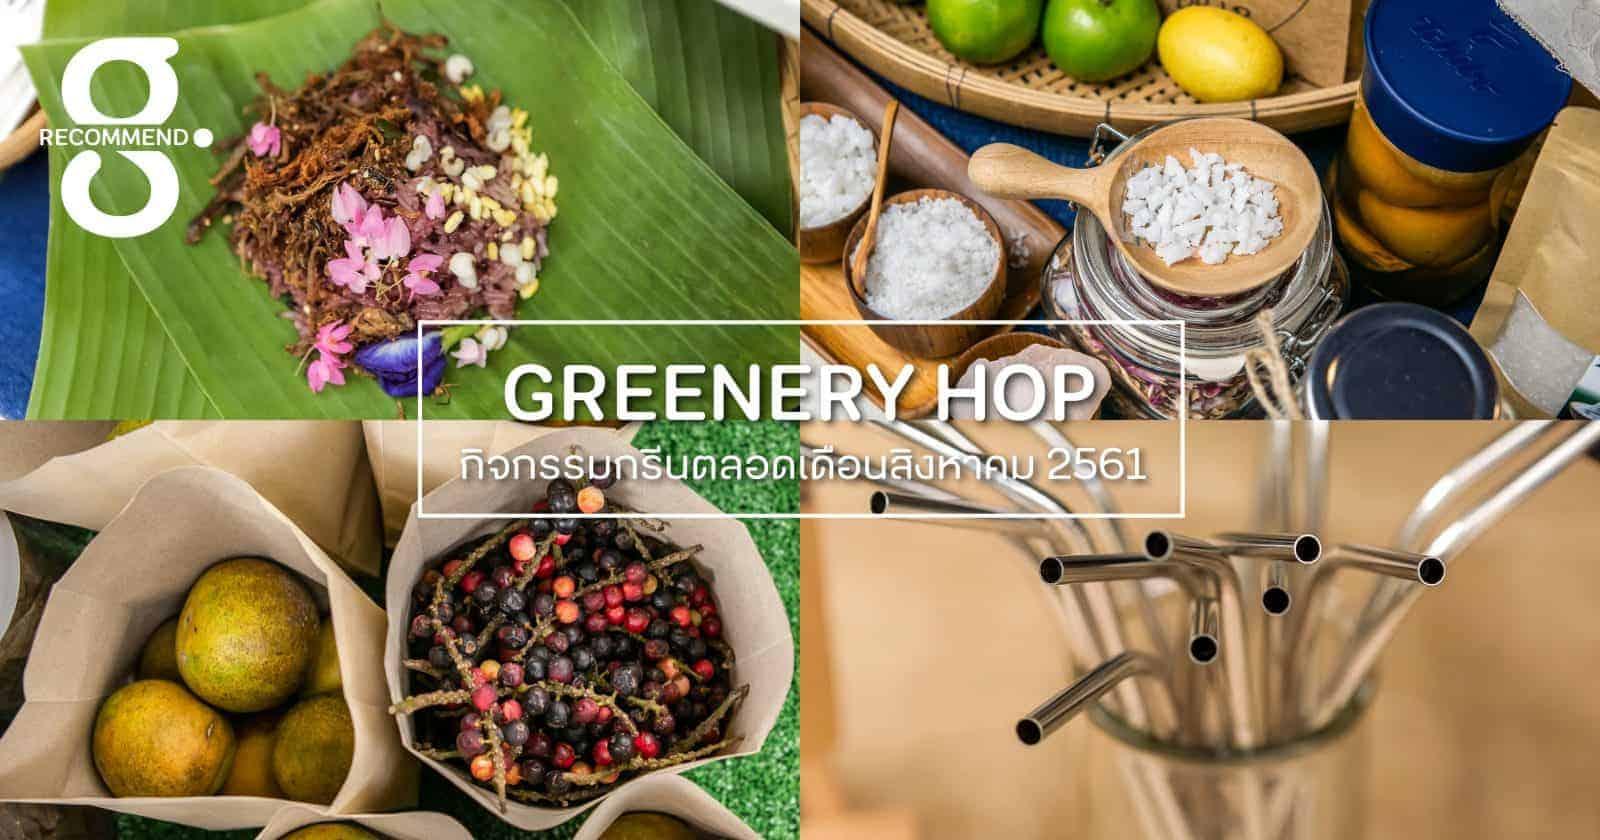 Greenery Hop: ชี้เป้ากิจกรรมดีๆ ที่น่าควงแม่ไปกรีนกัน 3 – 26 สิงหาคม นี้